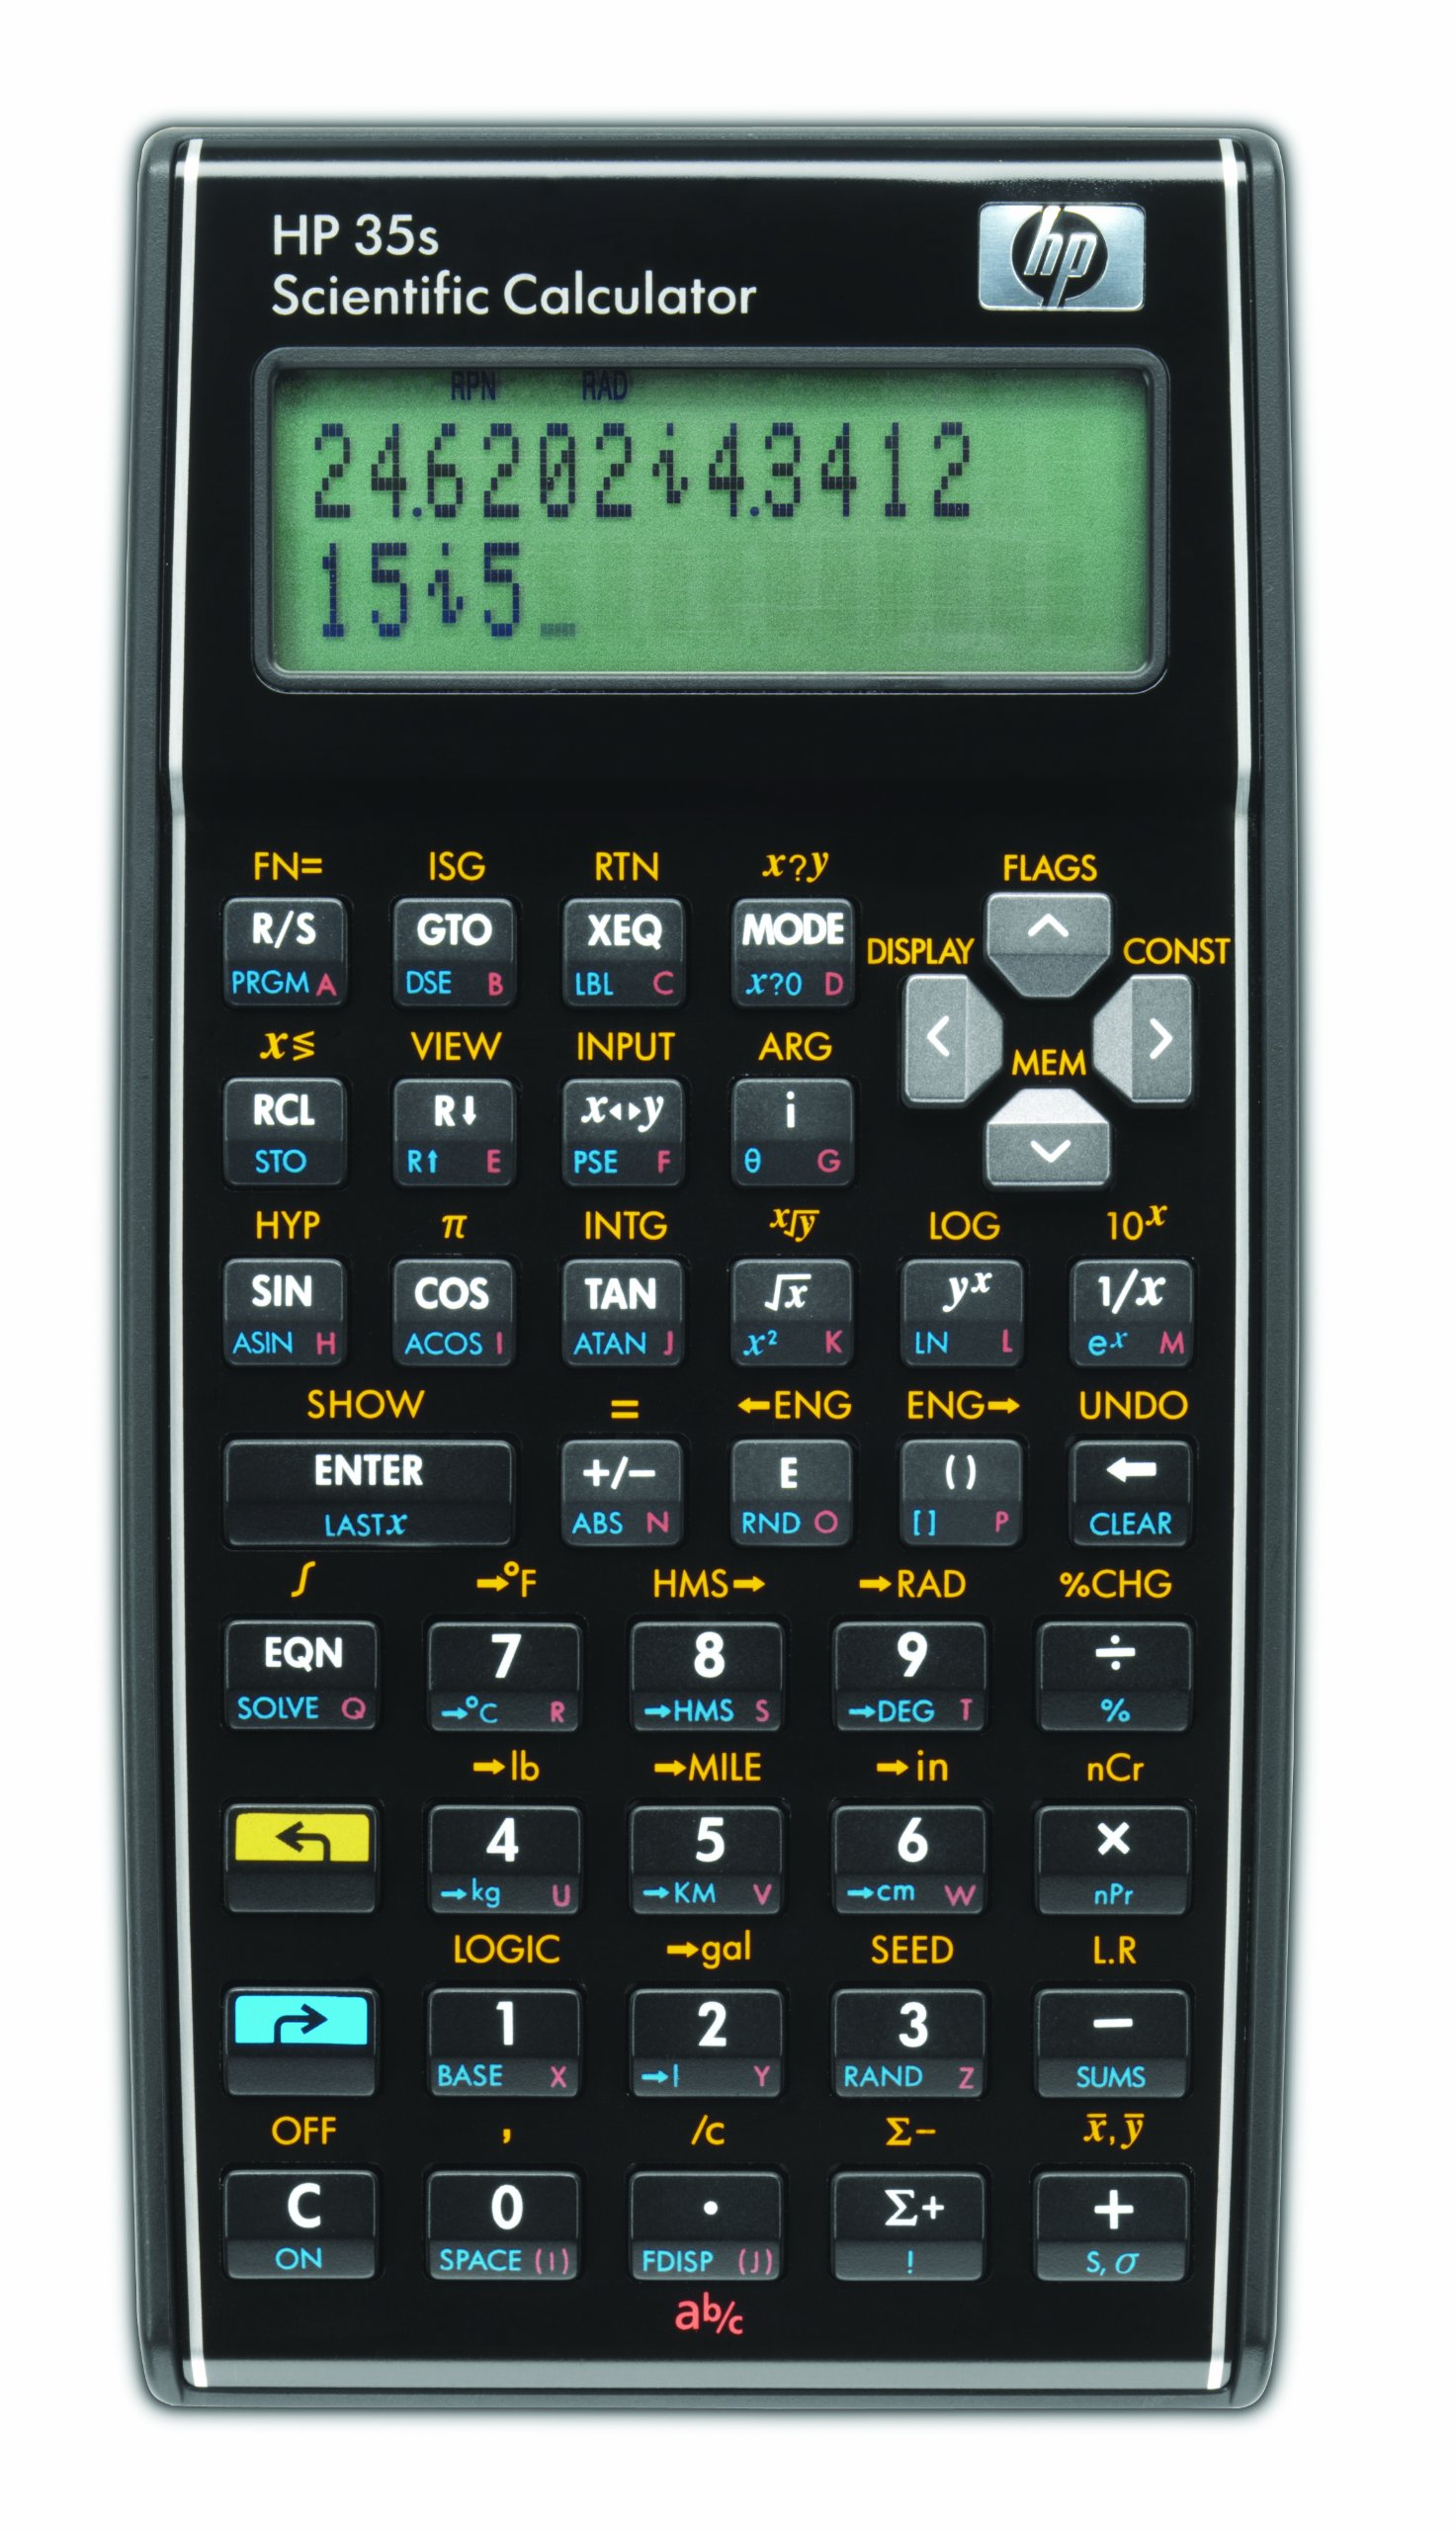 HP F2215AA HP35S Scientific Calculator, Black